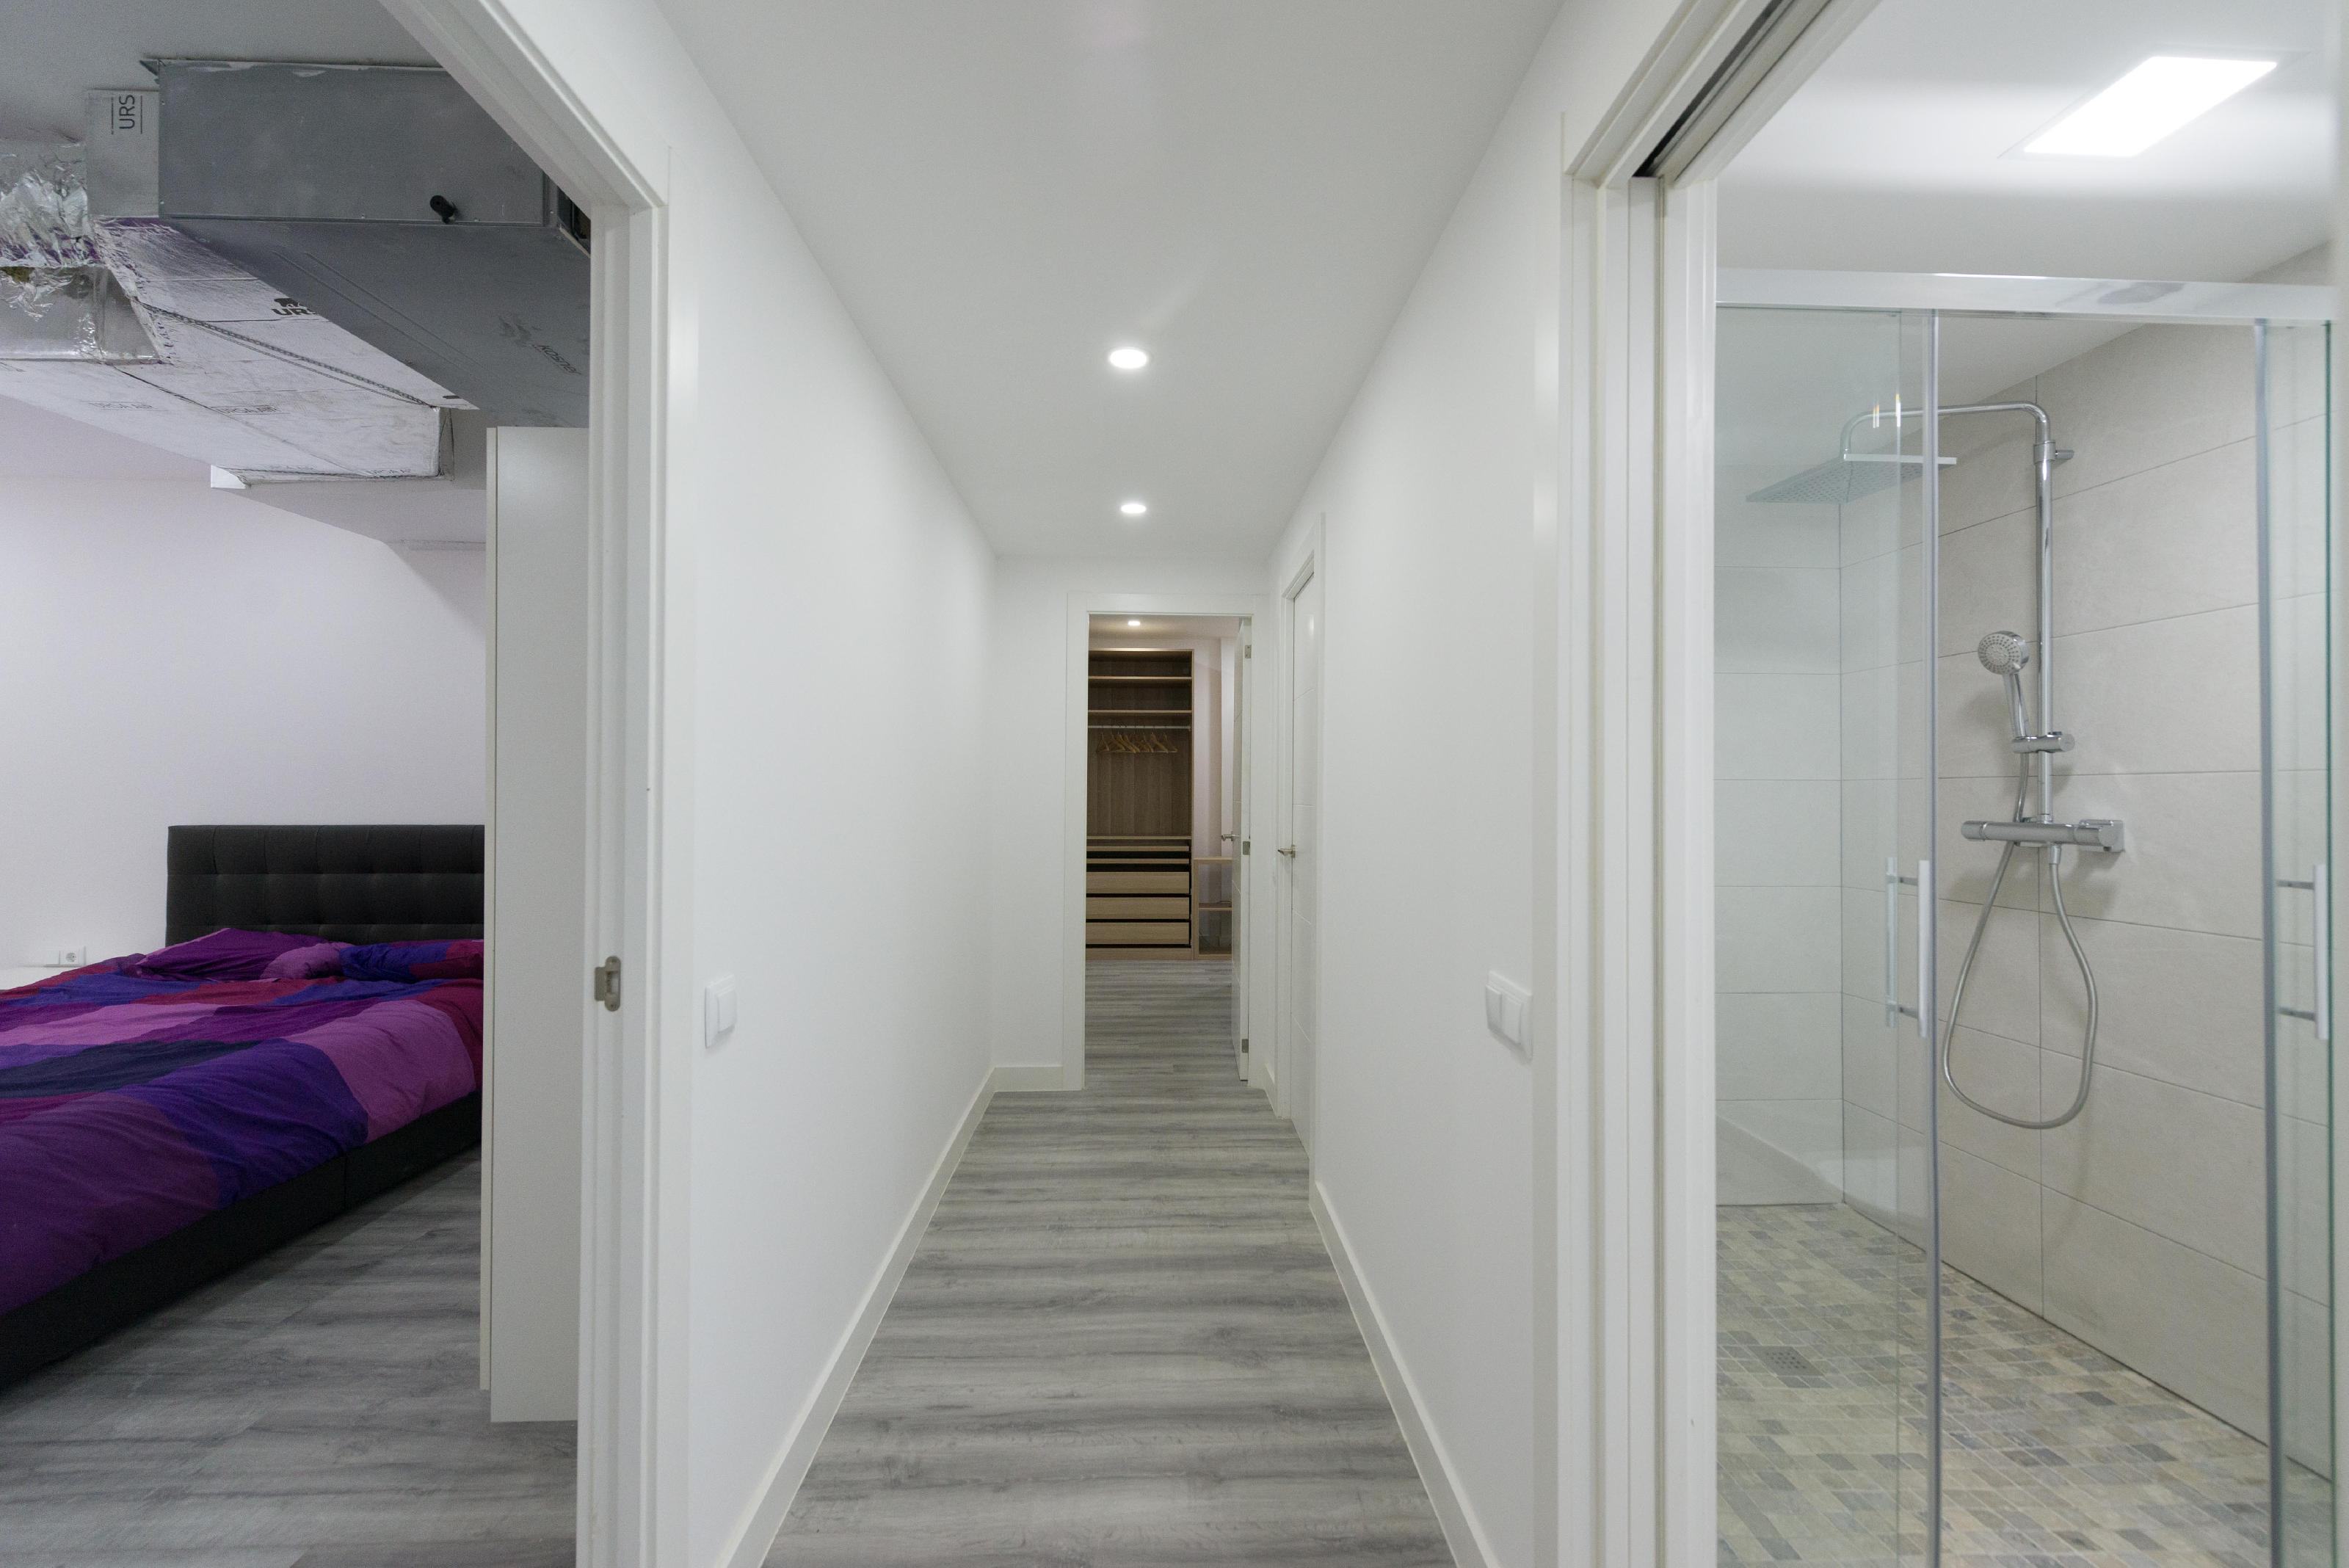 242980 Flat for sale in Eixample, Sagrada Familia 16